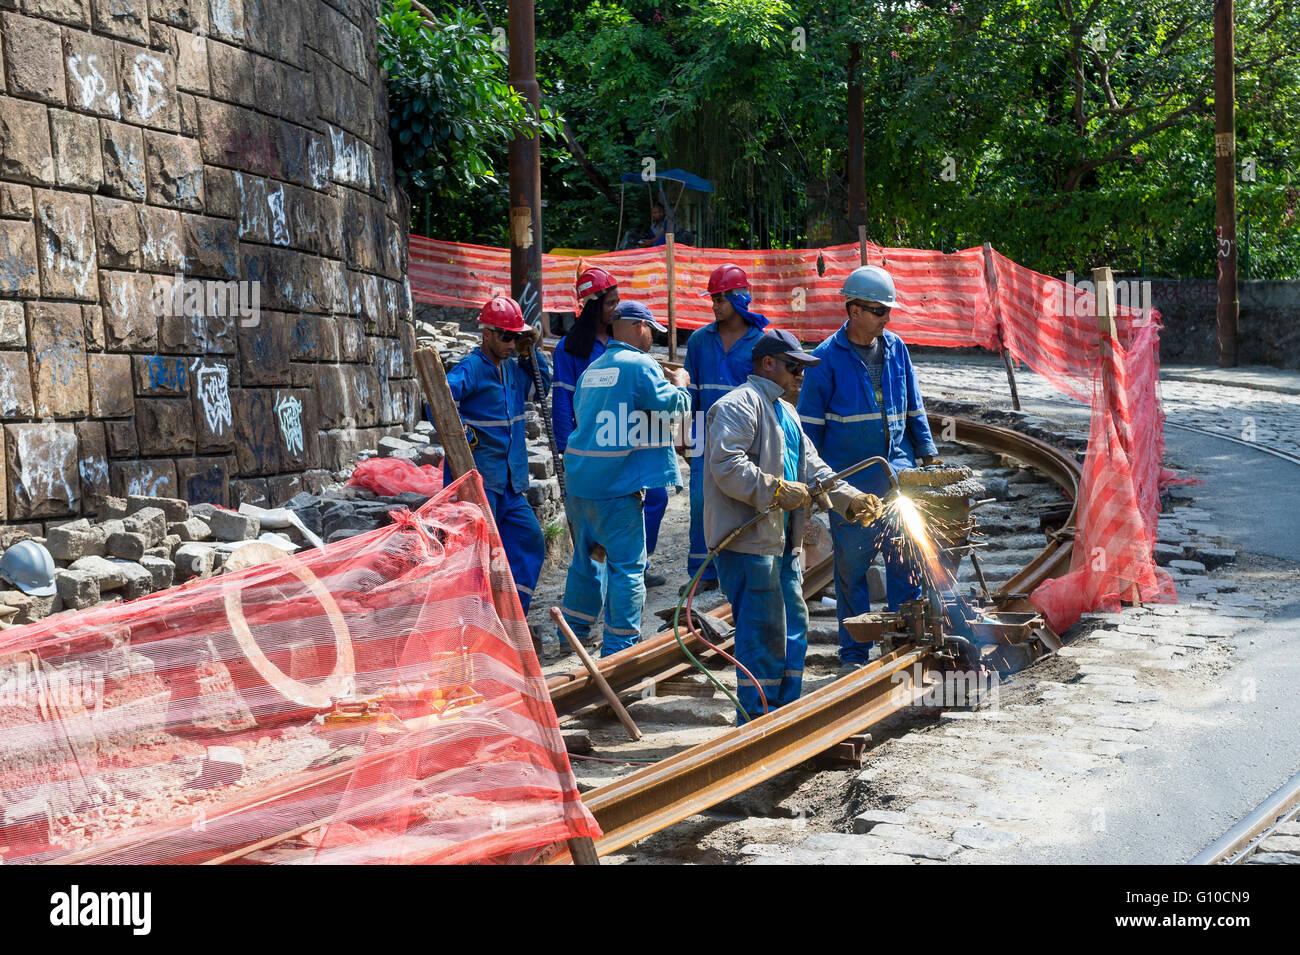 RIO DE JANEIRO - MARCH 24, 2016: Railway construction workers weld metal for trackwork the new bonde train in Santa - Stock Image